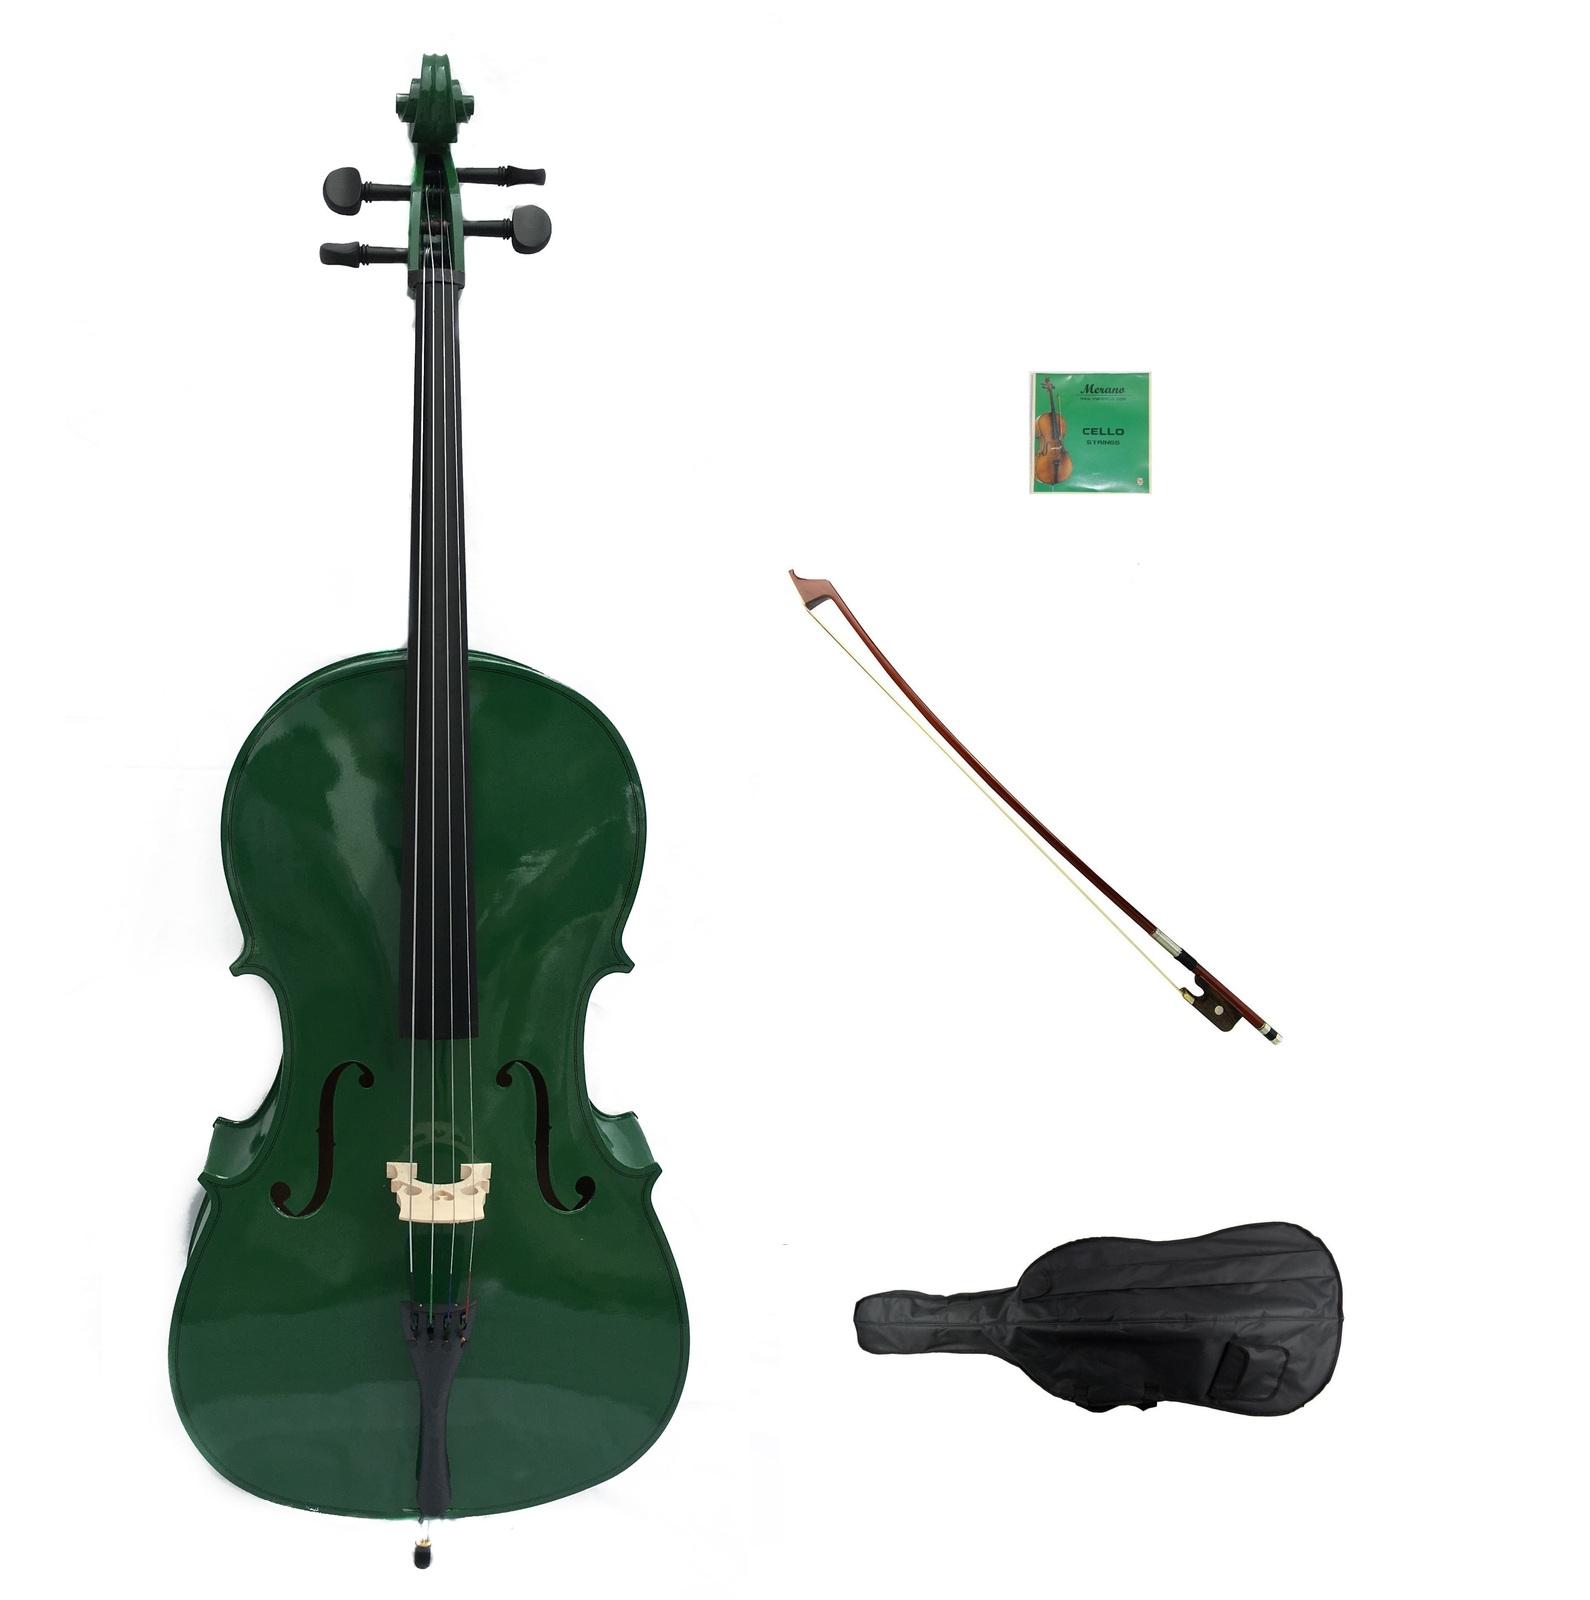 Merano 4/4 Size GREEN Cello,Hard Case,Soft Bag,Bow,Strings,Rosin,Cello Stand